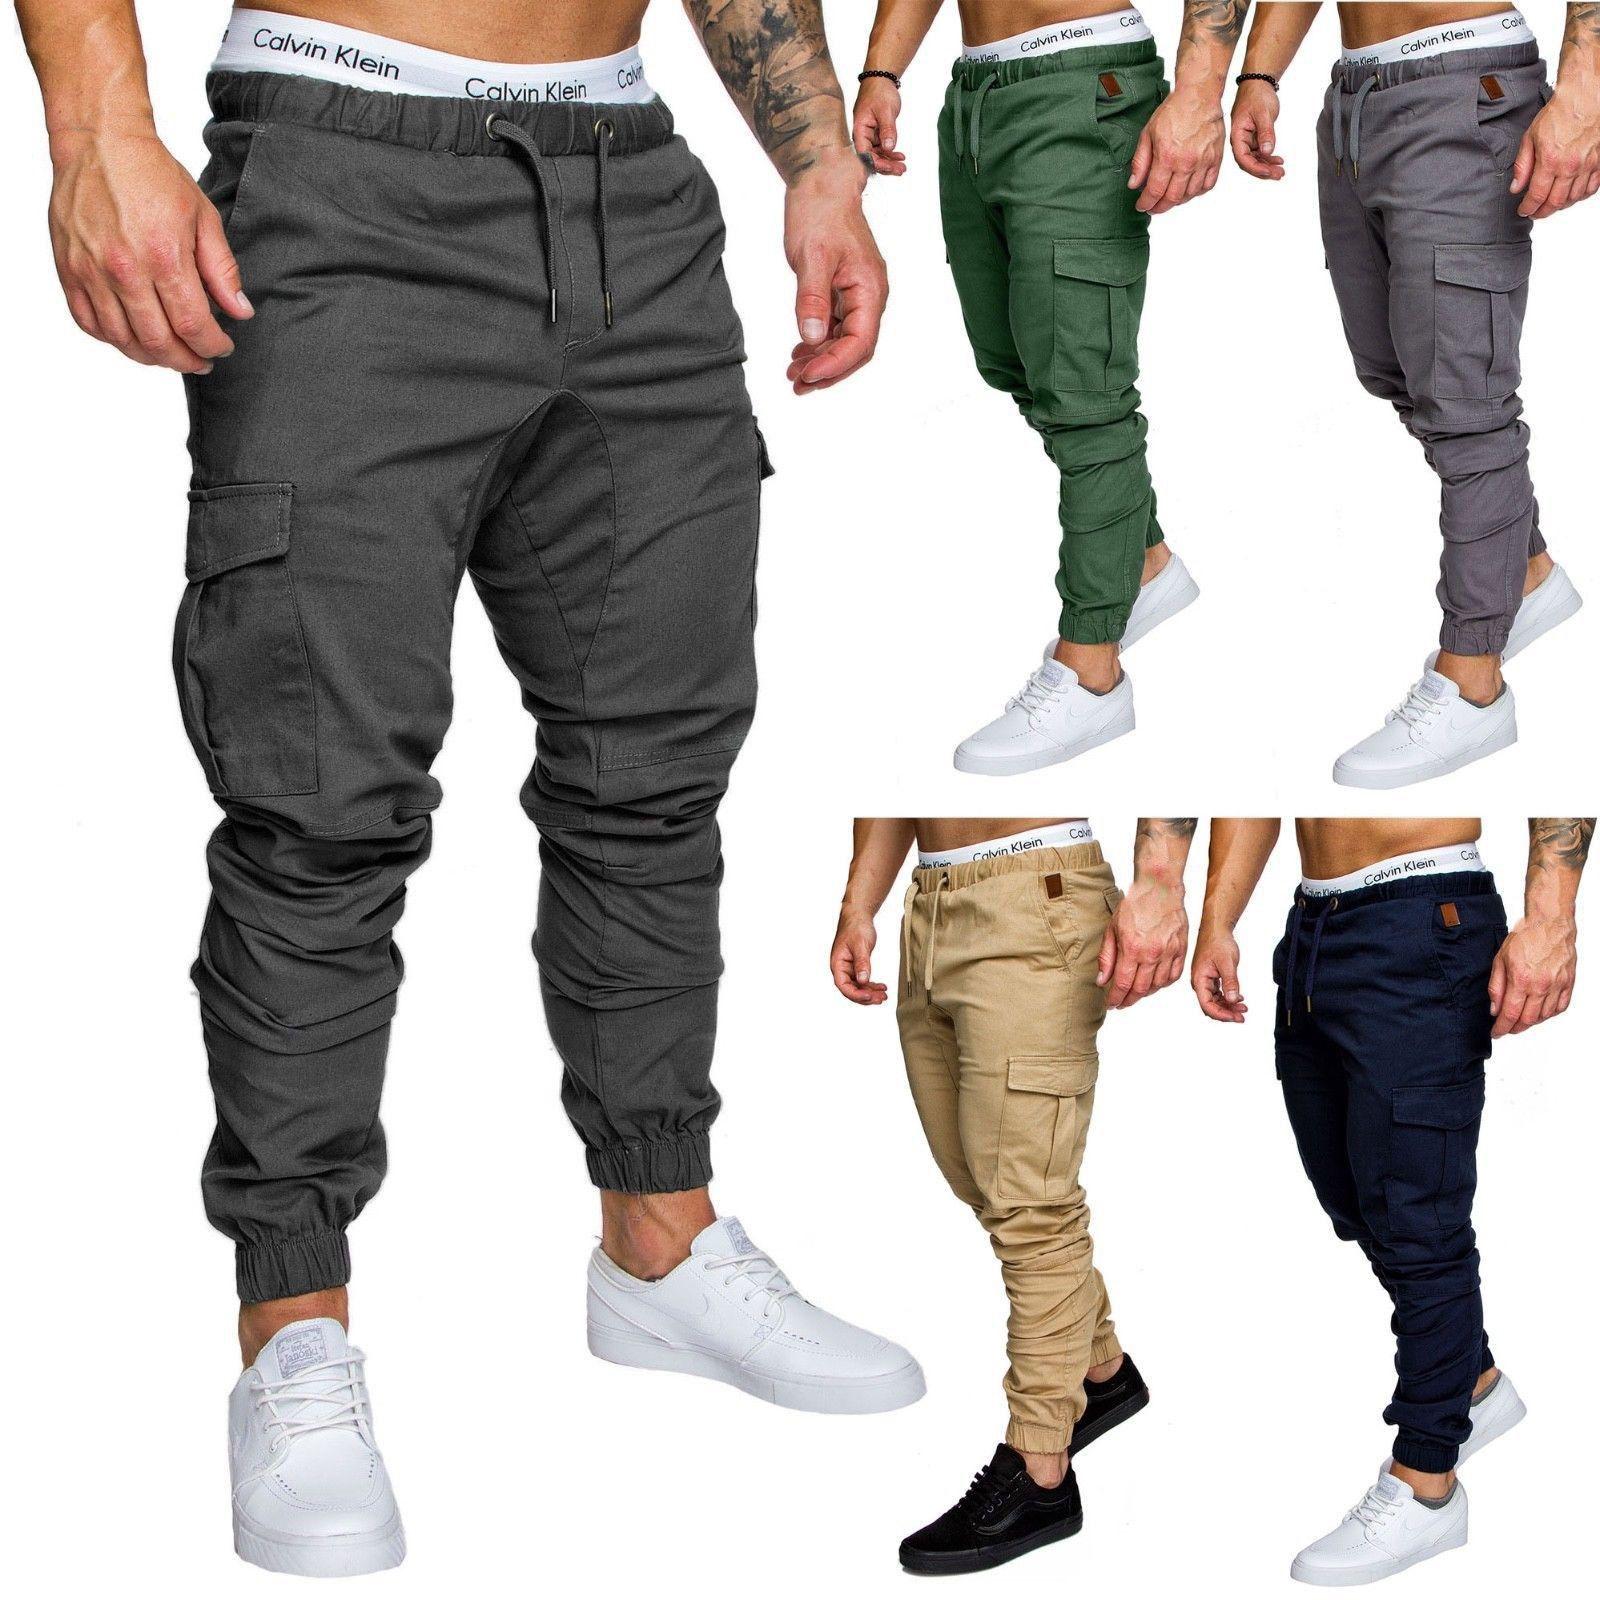 2018 New Fashion Hot Popular Mens Slim Fit Urban Straight Leg Trousers Casual Pencil Jogger Cargo Pants Pants